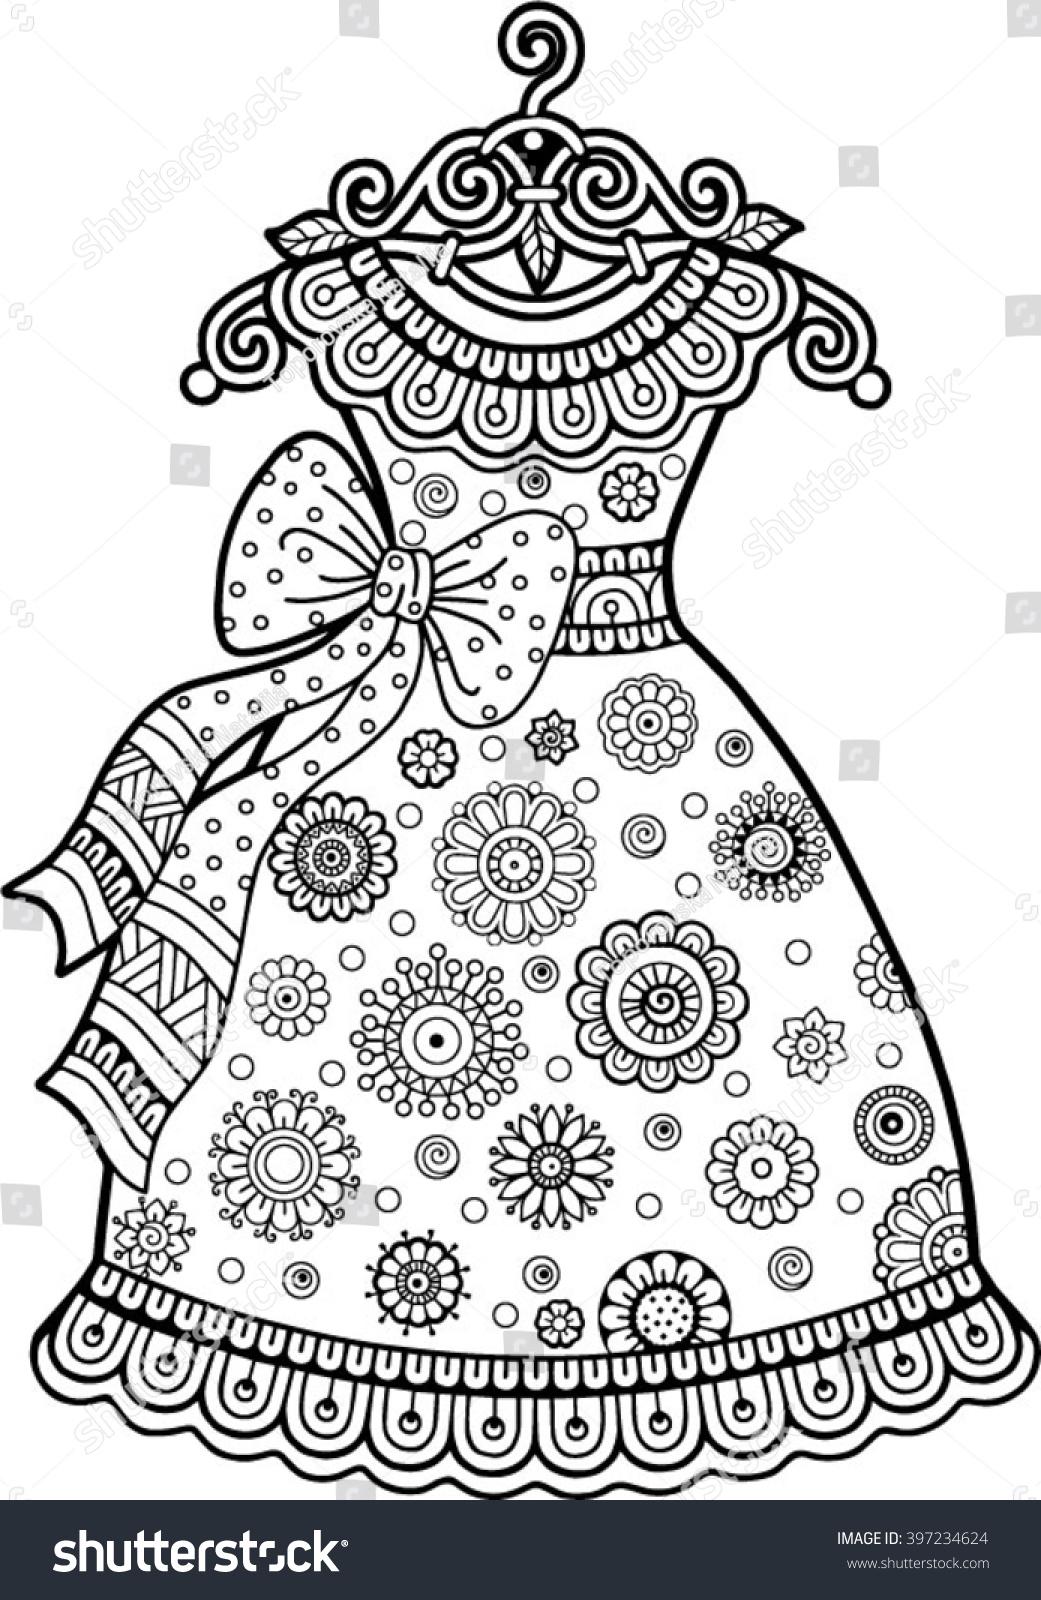 Design a dress coloring book